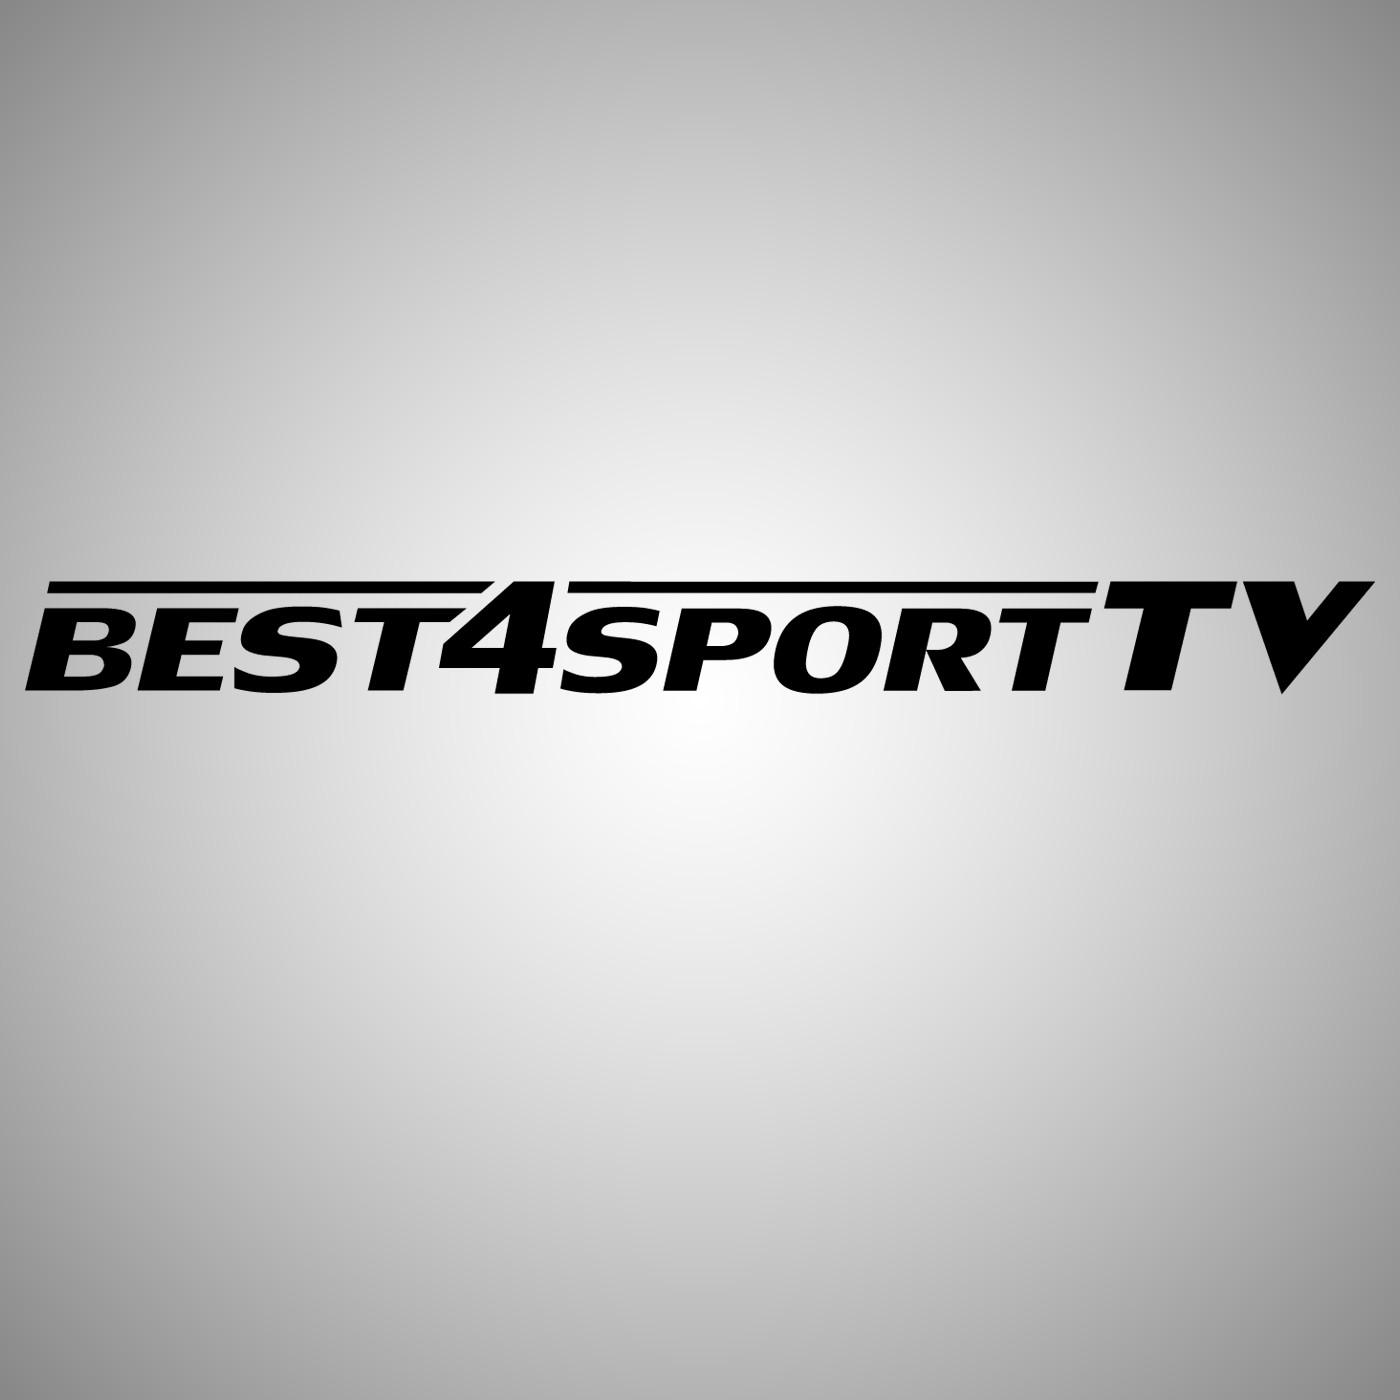 best4sporttv